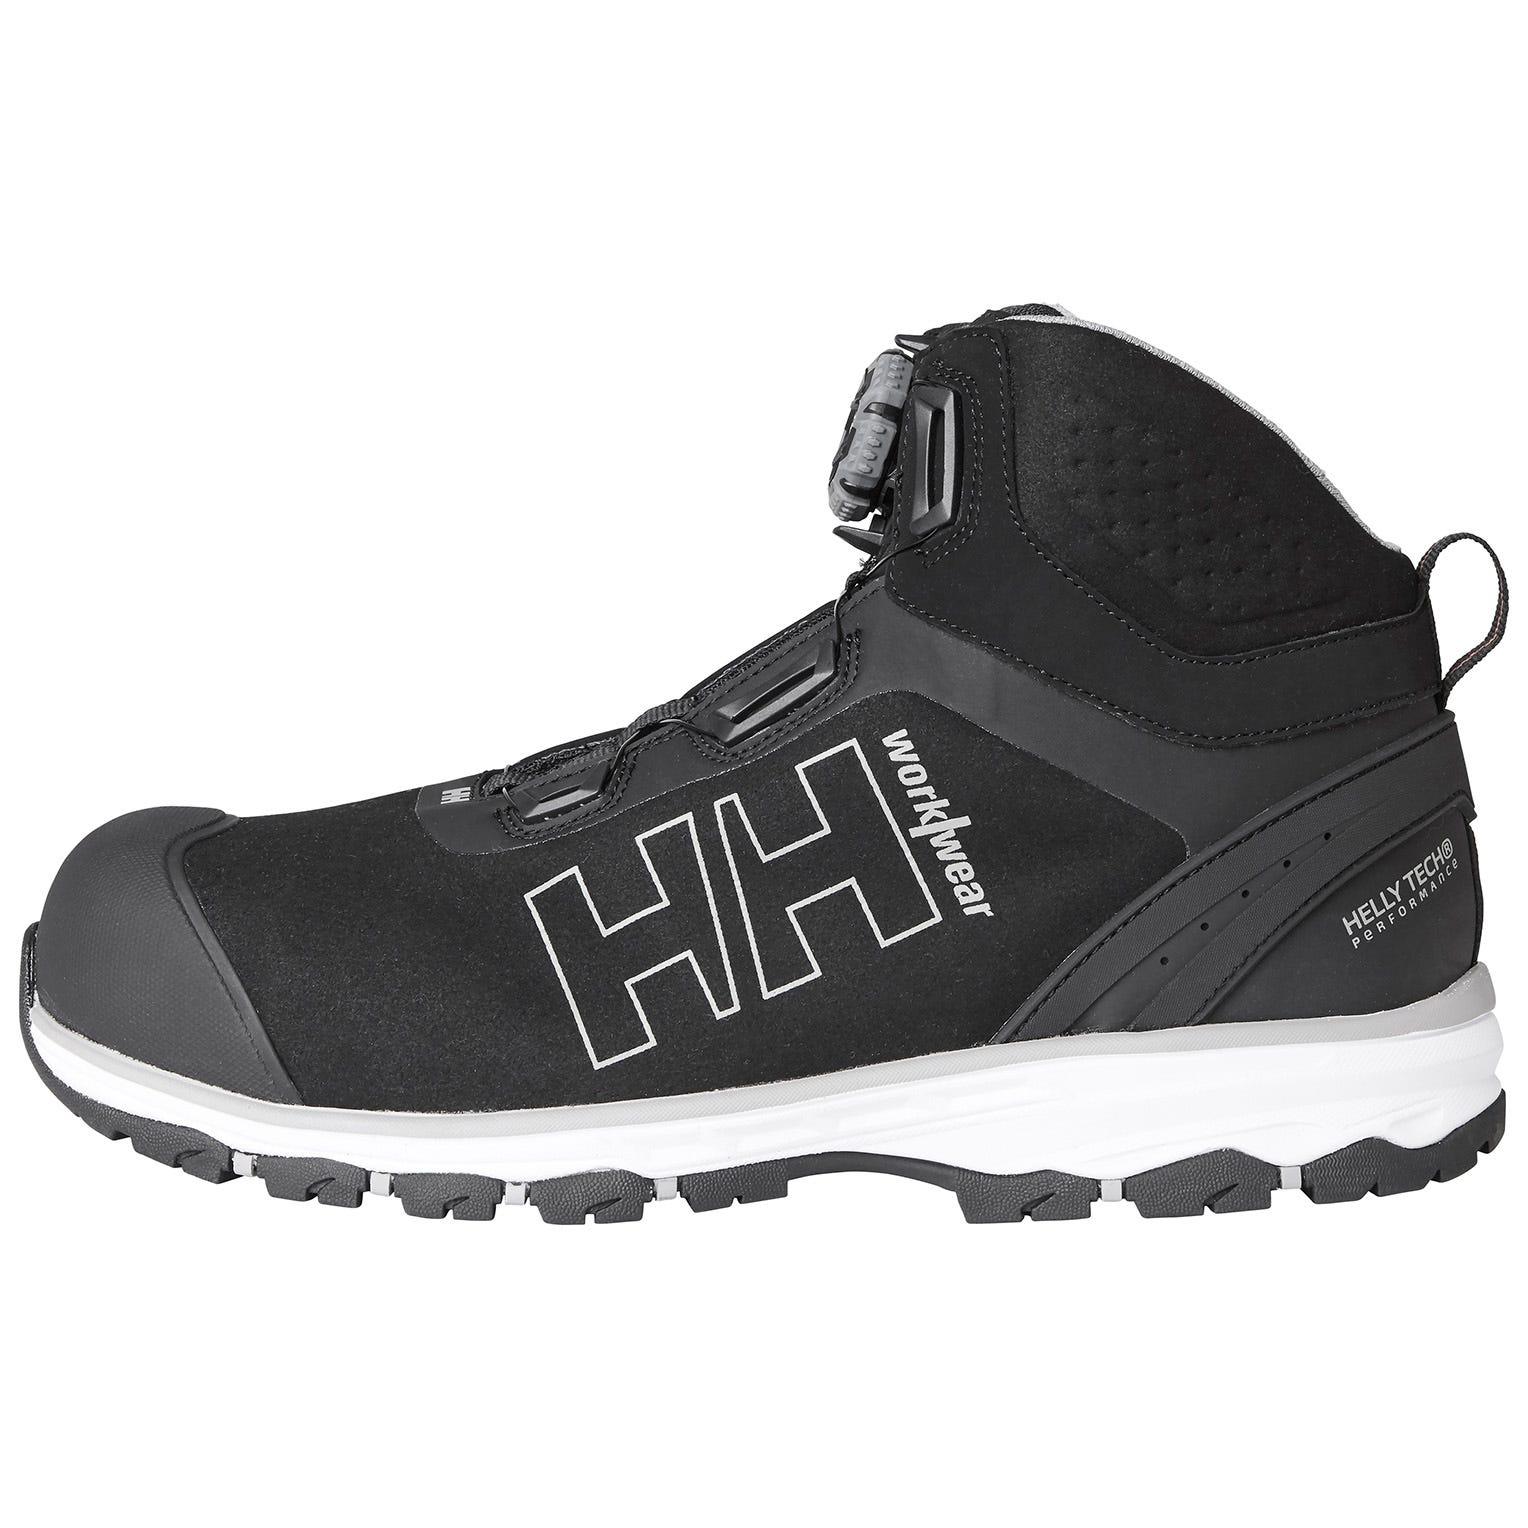 HH Workwear Workwear Helly Hansen Chelsea Evolution Mid Boa Wide Safety Shoes 44 Grigio